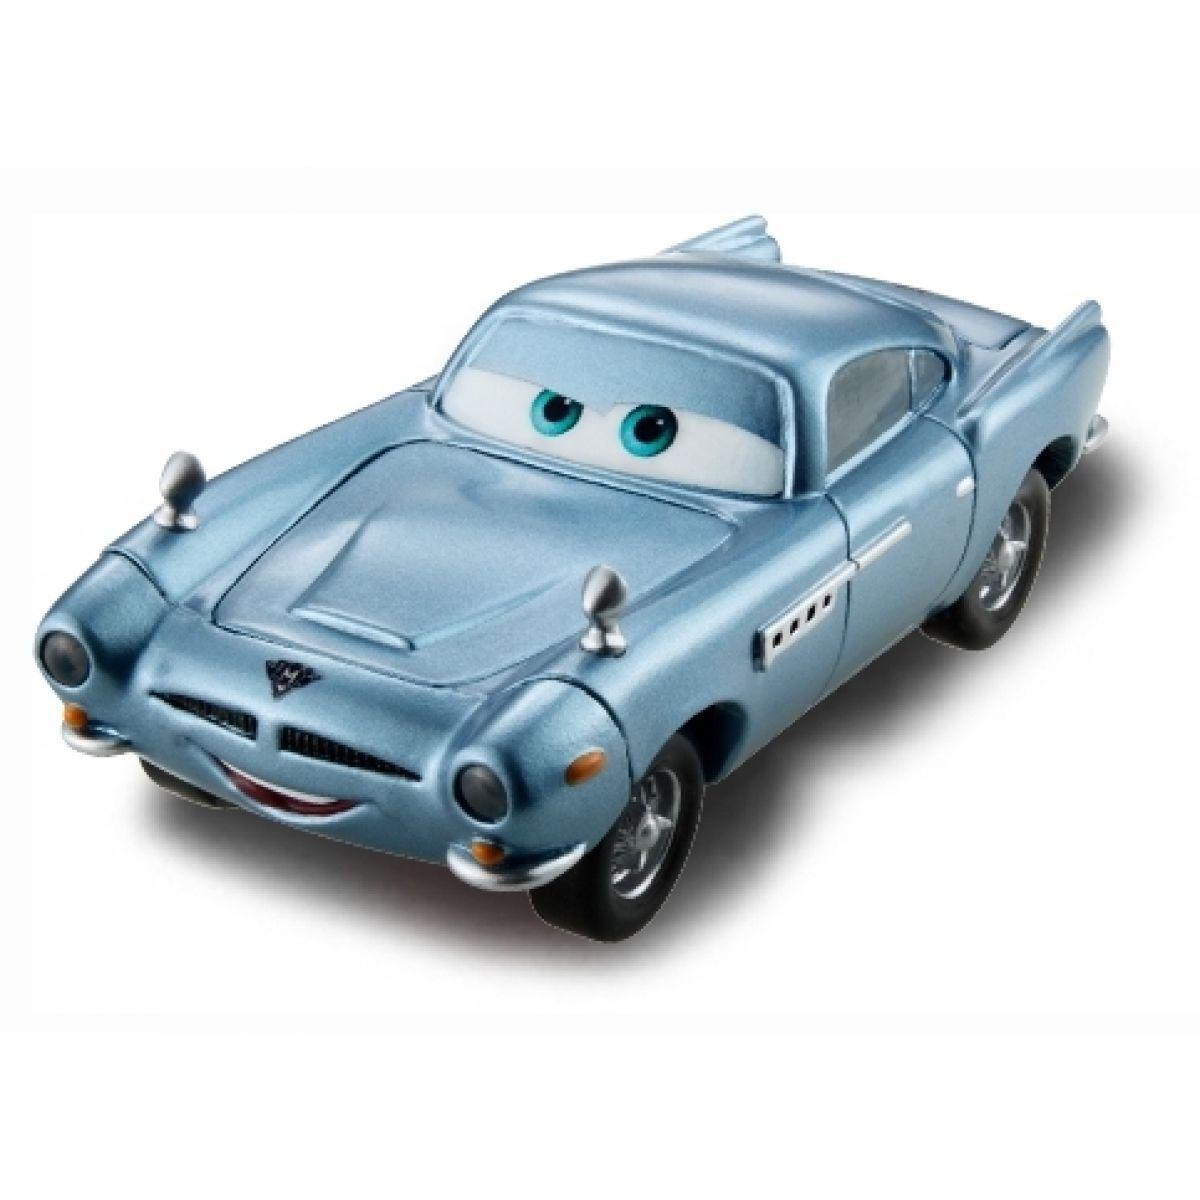 Mattel Cars Auta - Finn McMissile